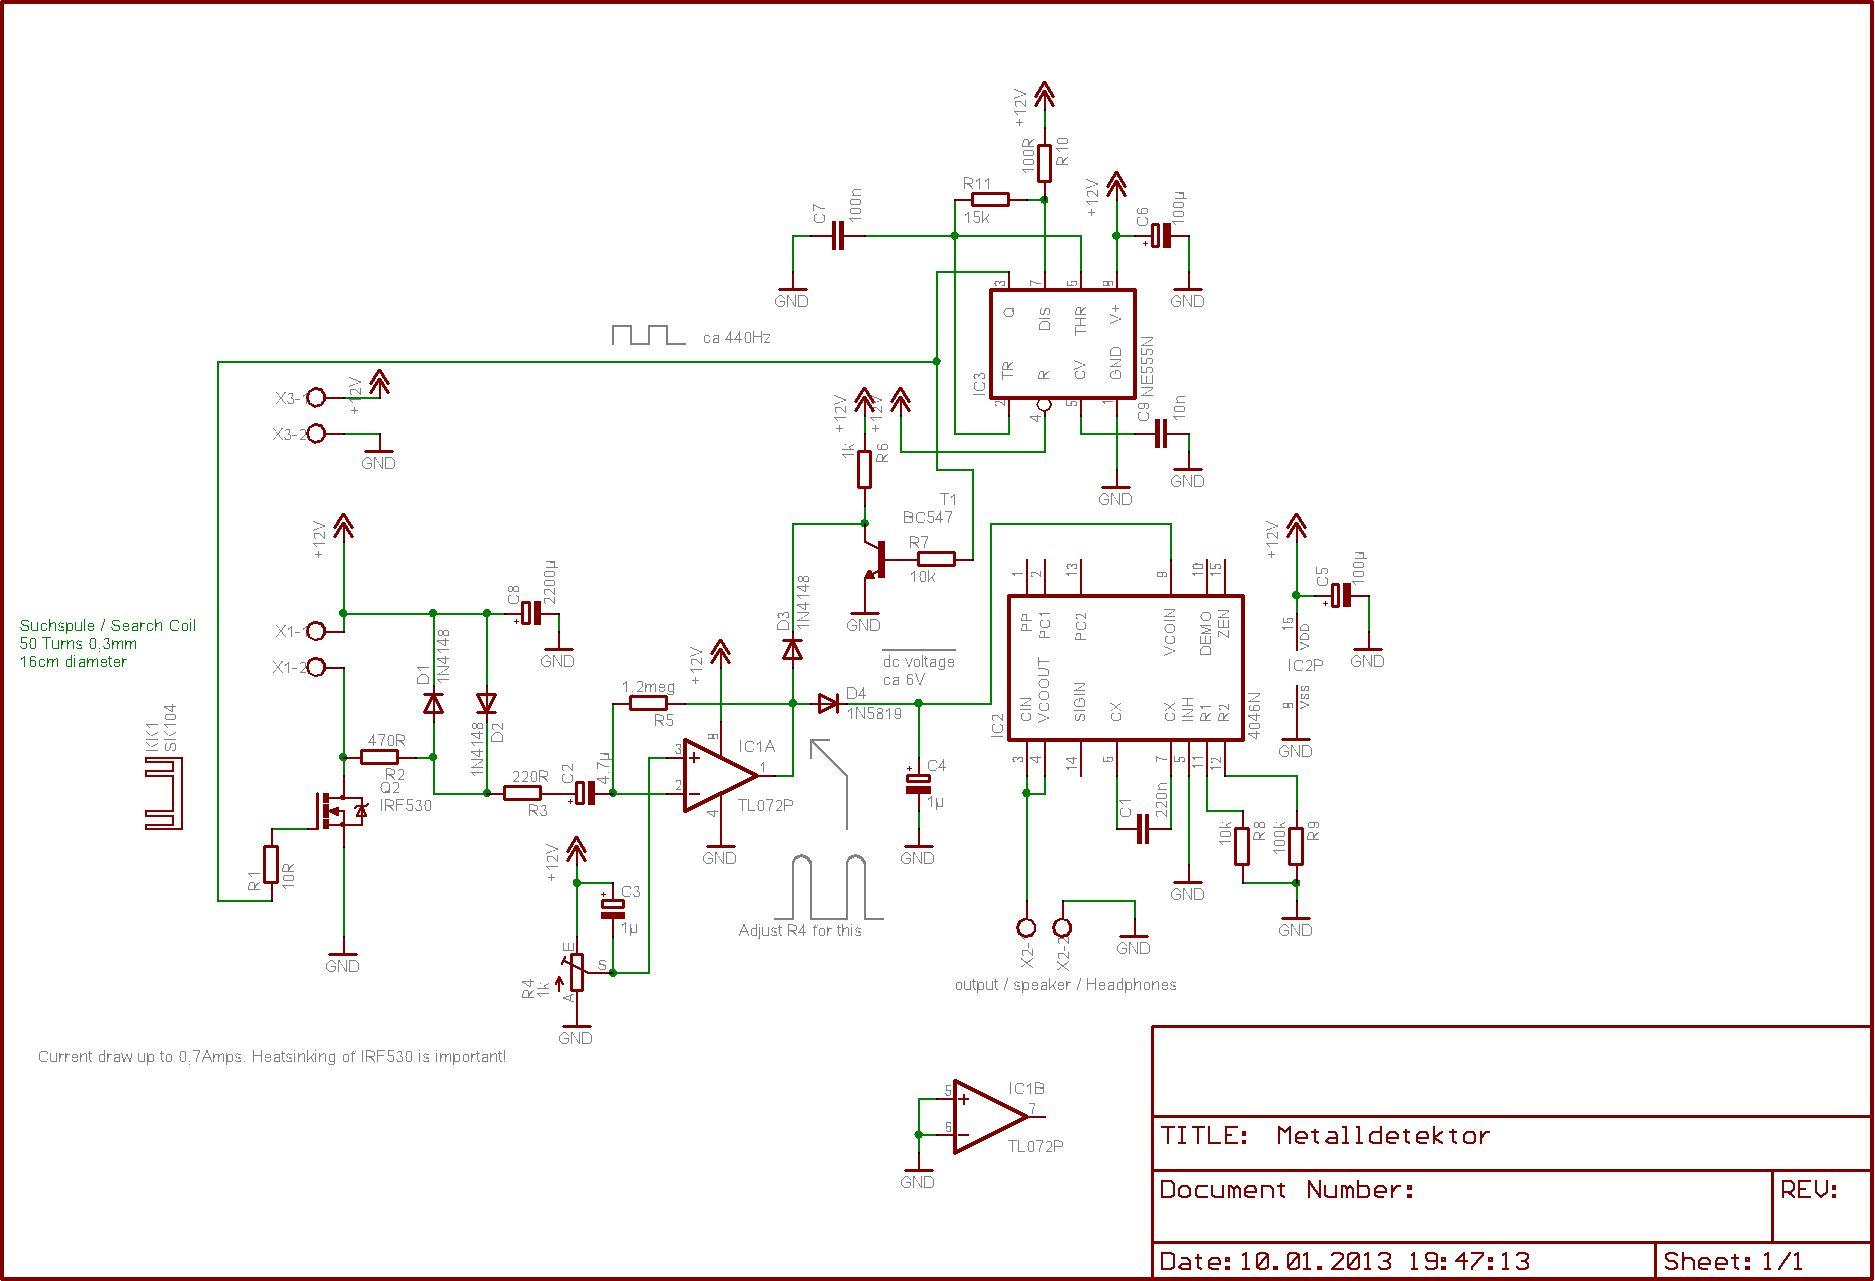 Index Of Image Cheap Metal Detector Circuit Schematic 1357845104 76 Ft148849 Metalldetektor Shematik 160k